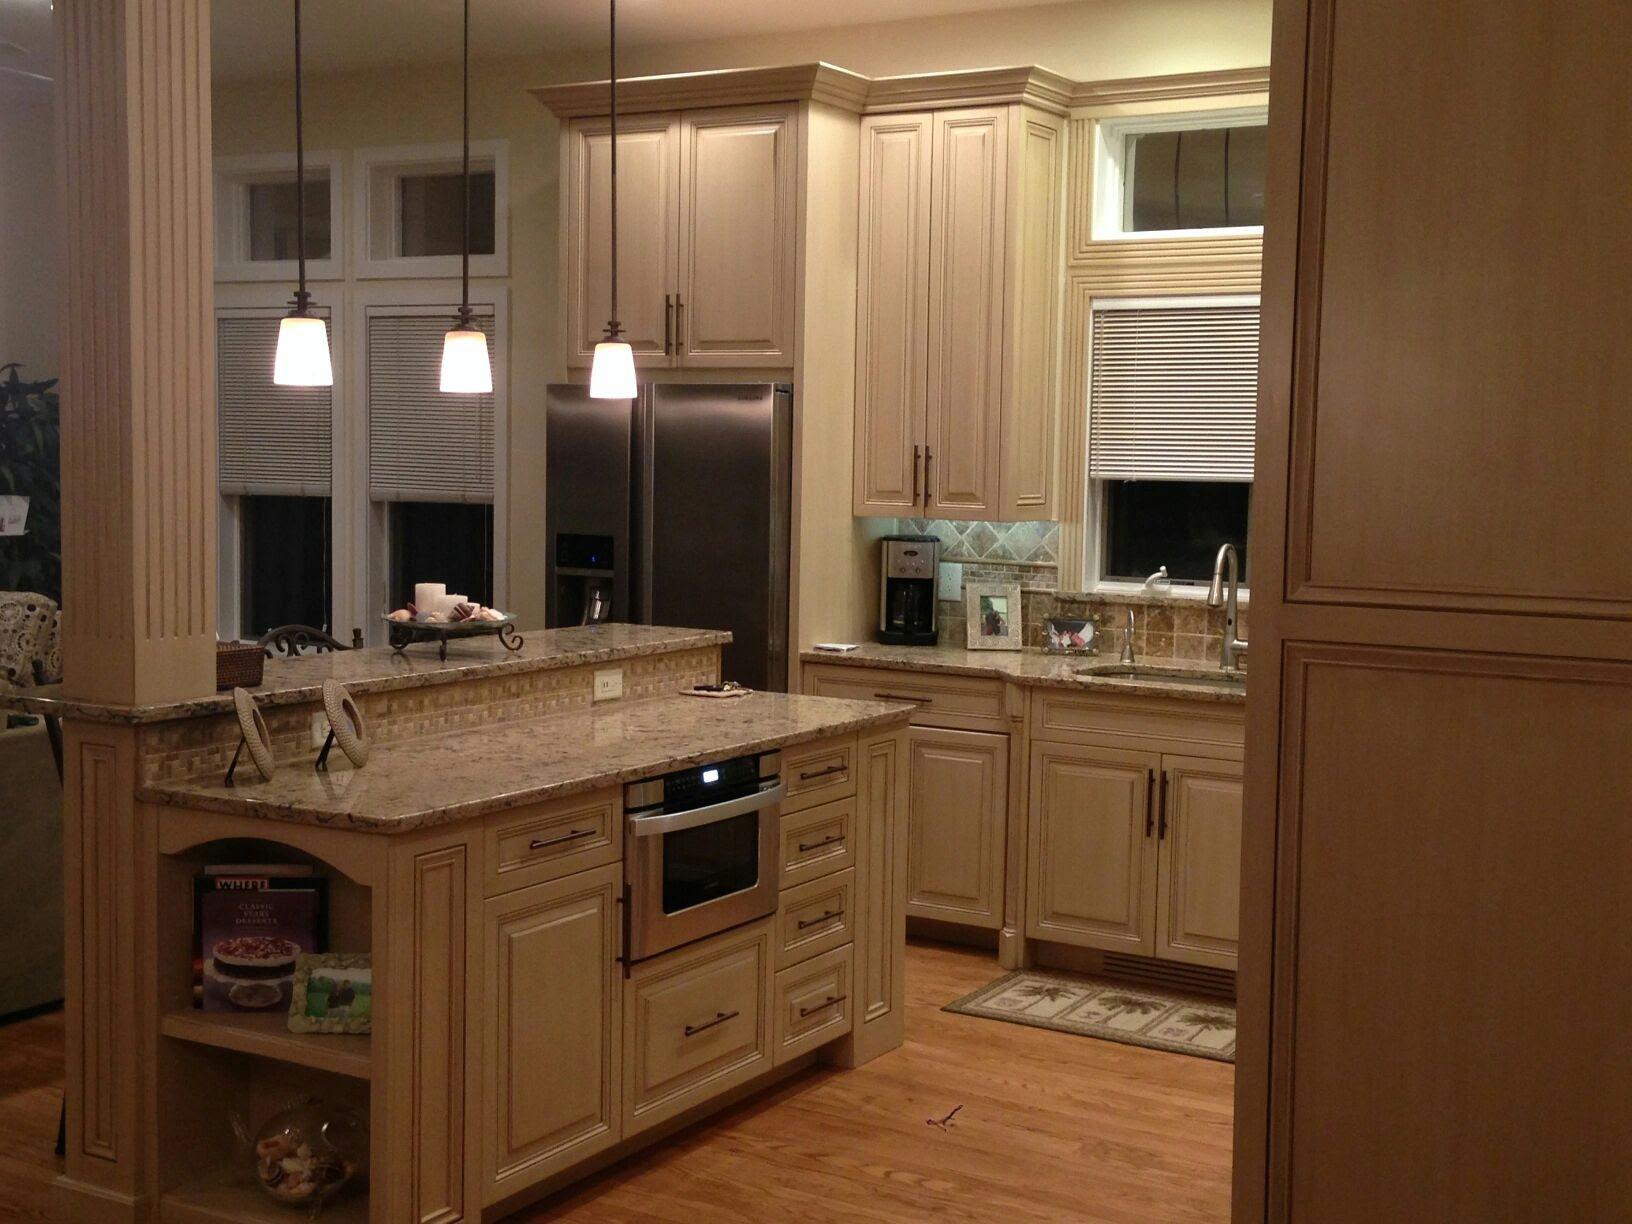 Kitchen Cabinets - Elite Cabinets and Design LLC   Elite ...